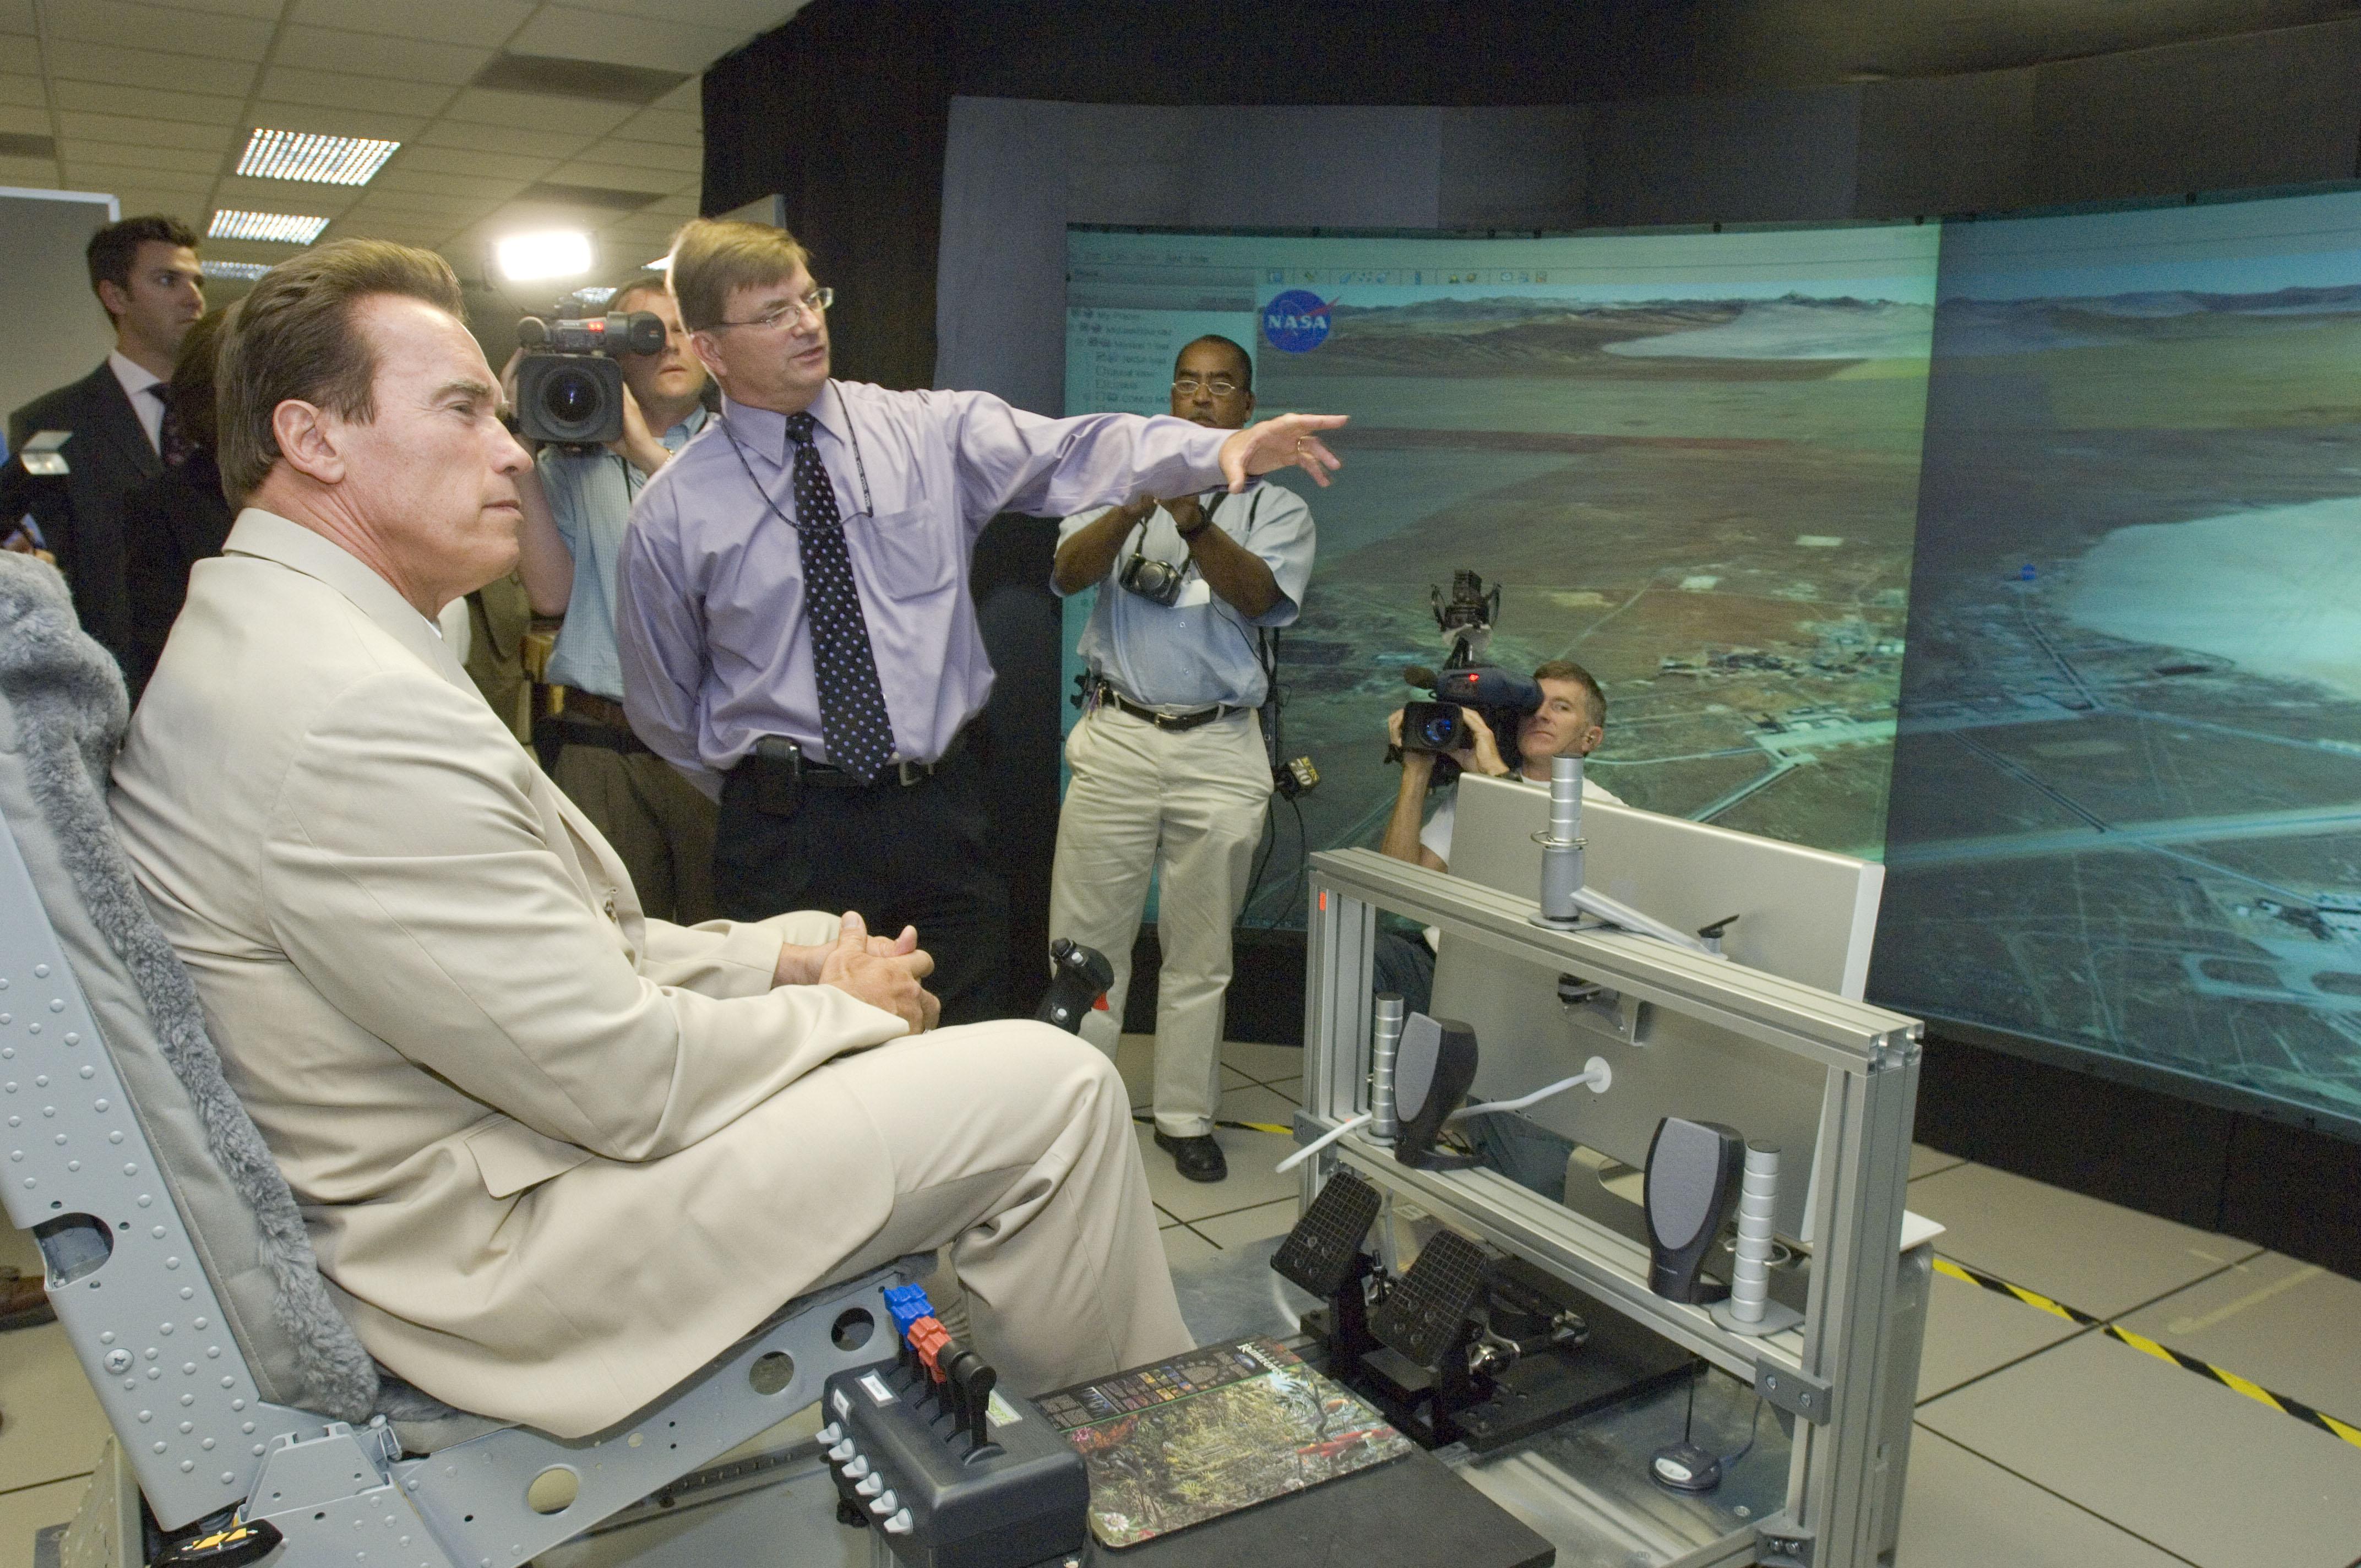 astronaut flight simulator - photo #27